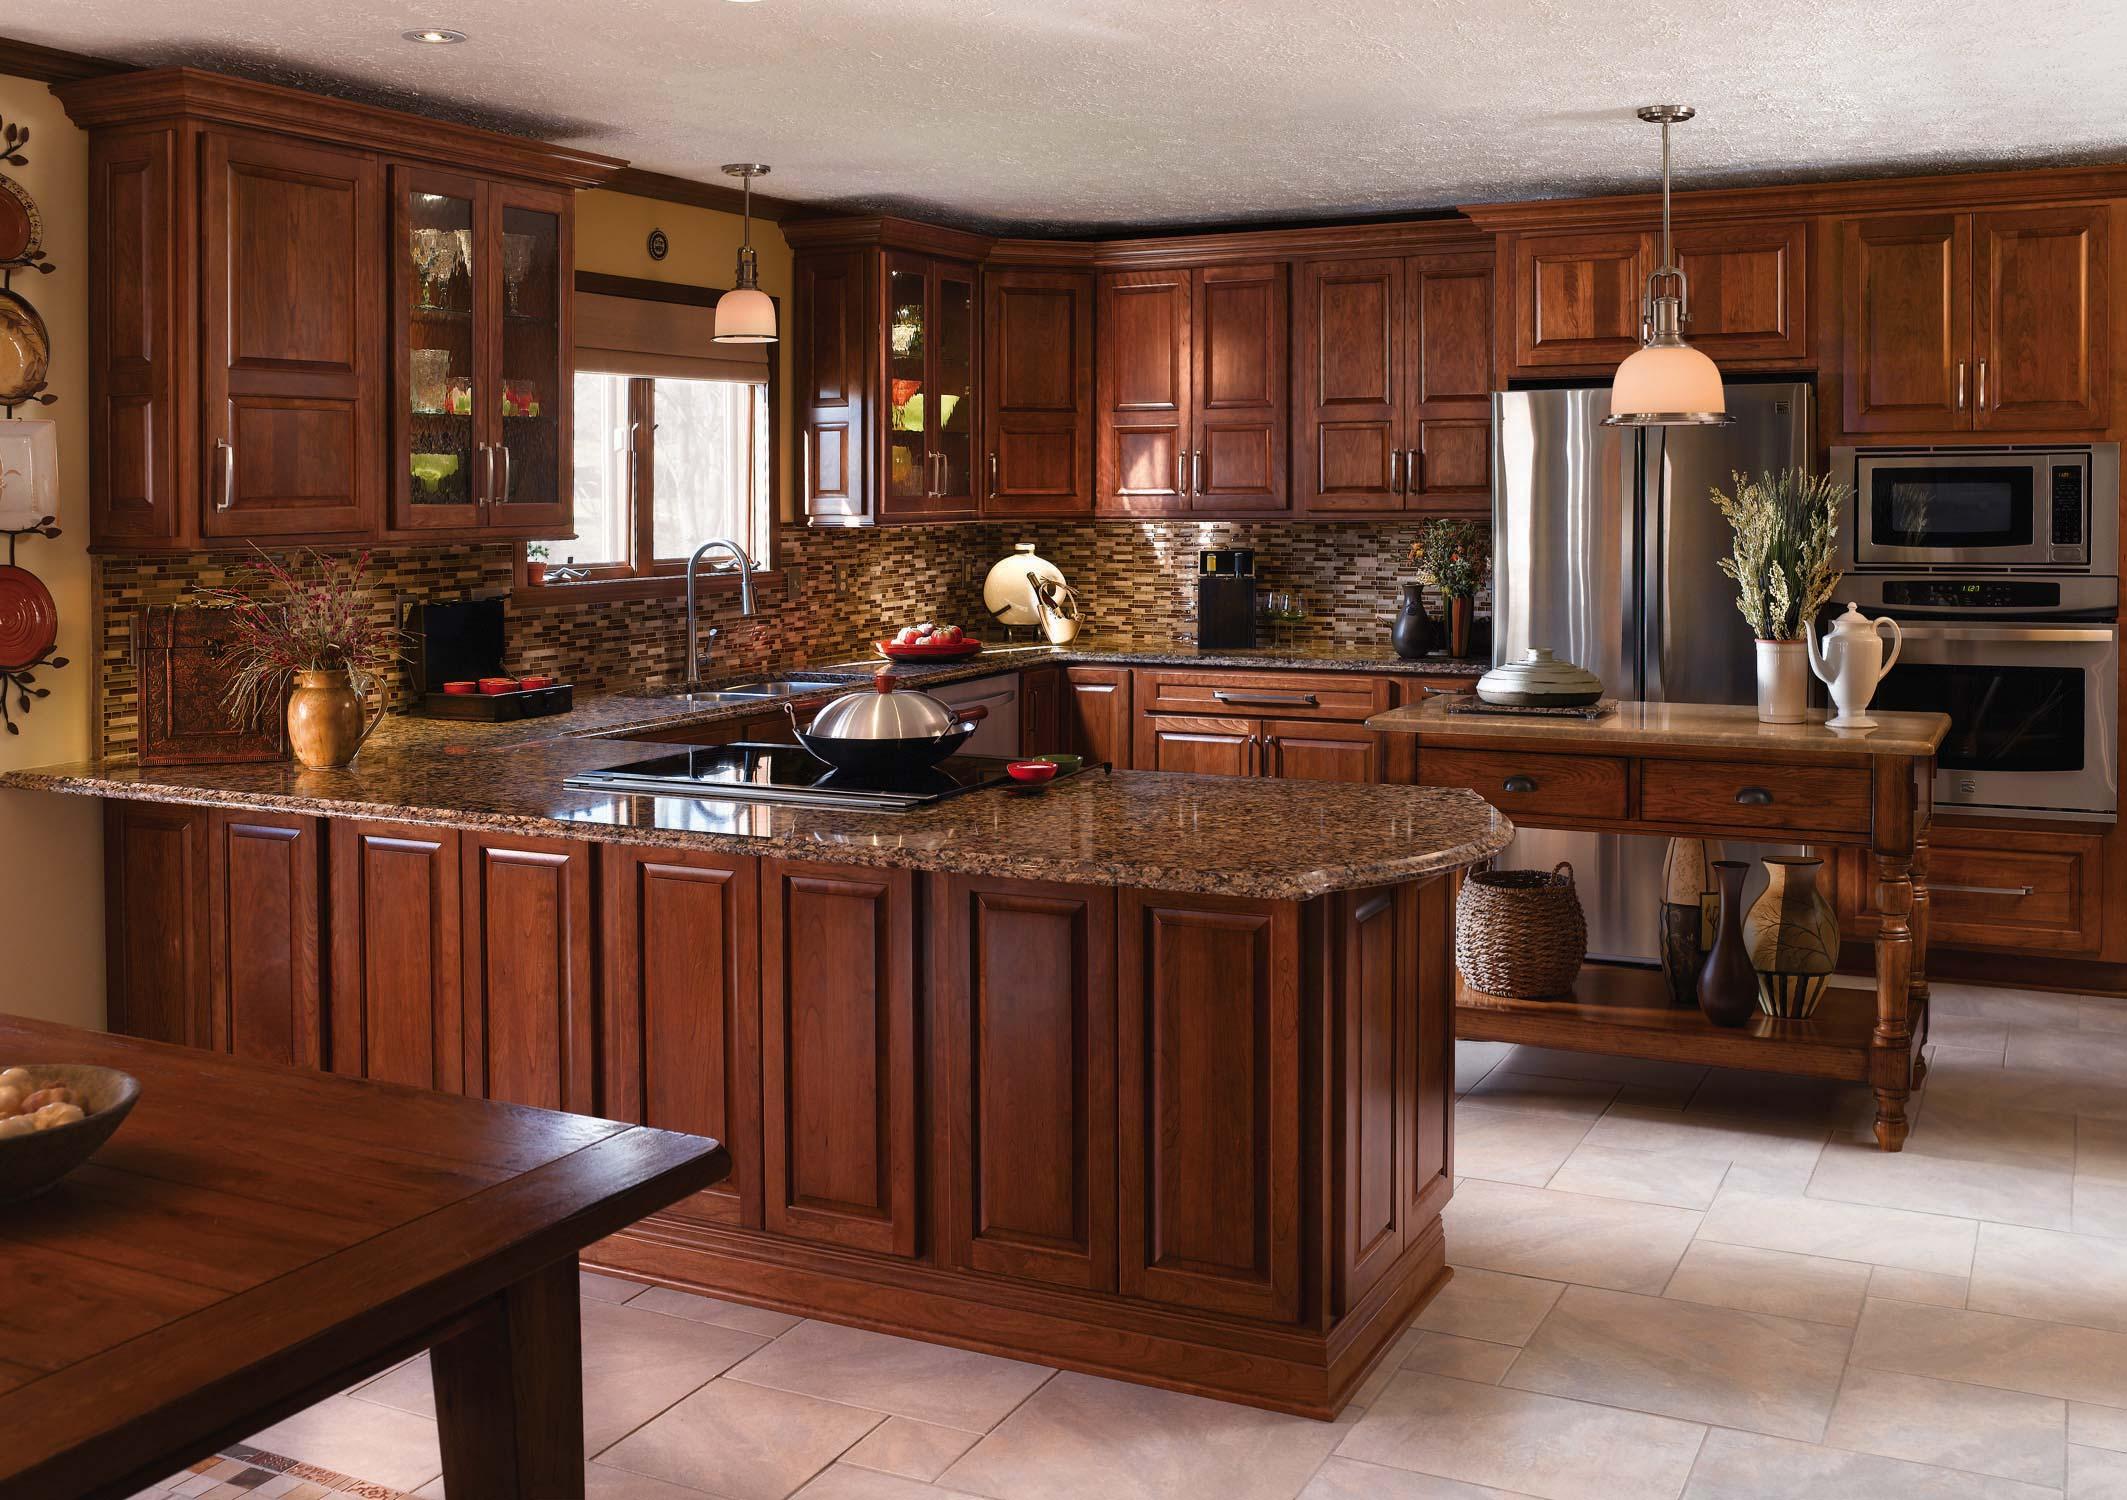 Design Remodeling Home Kitchen Supply